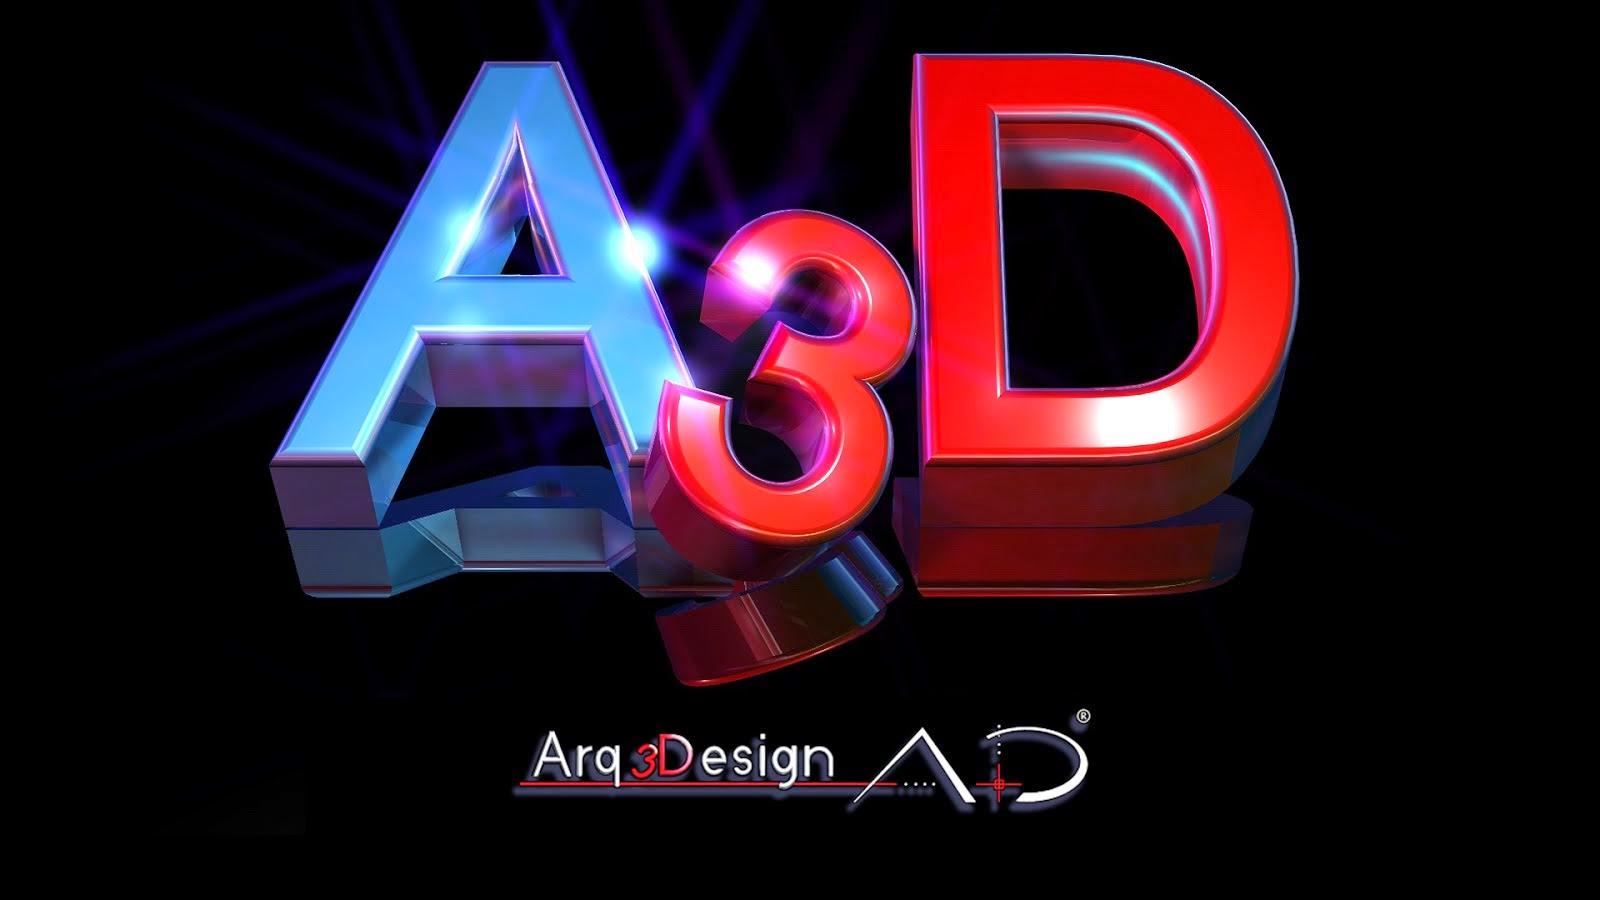 Reformas Salamanca A3D Arq3Design